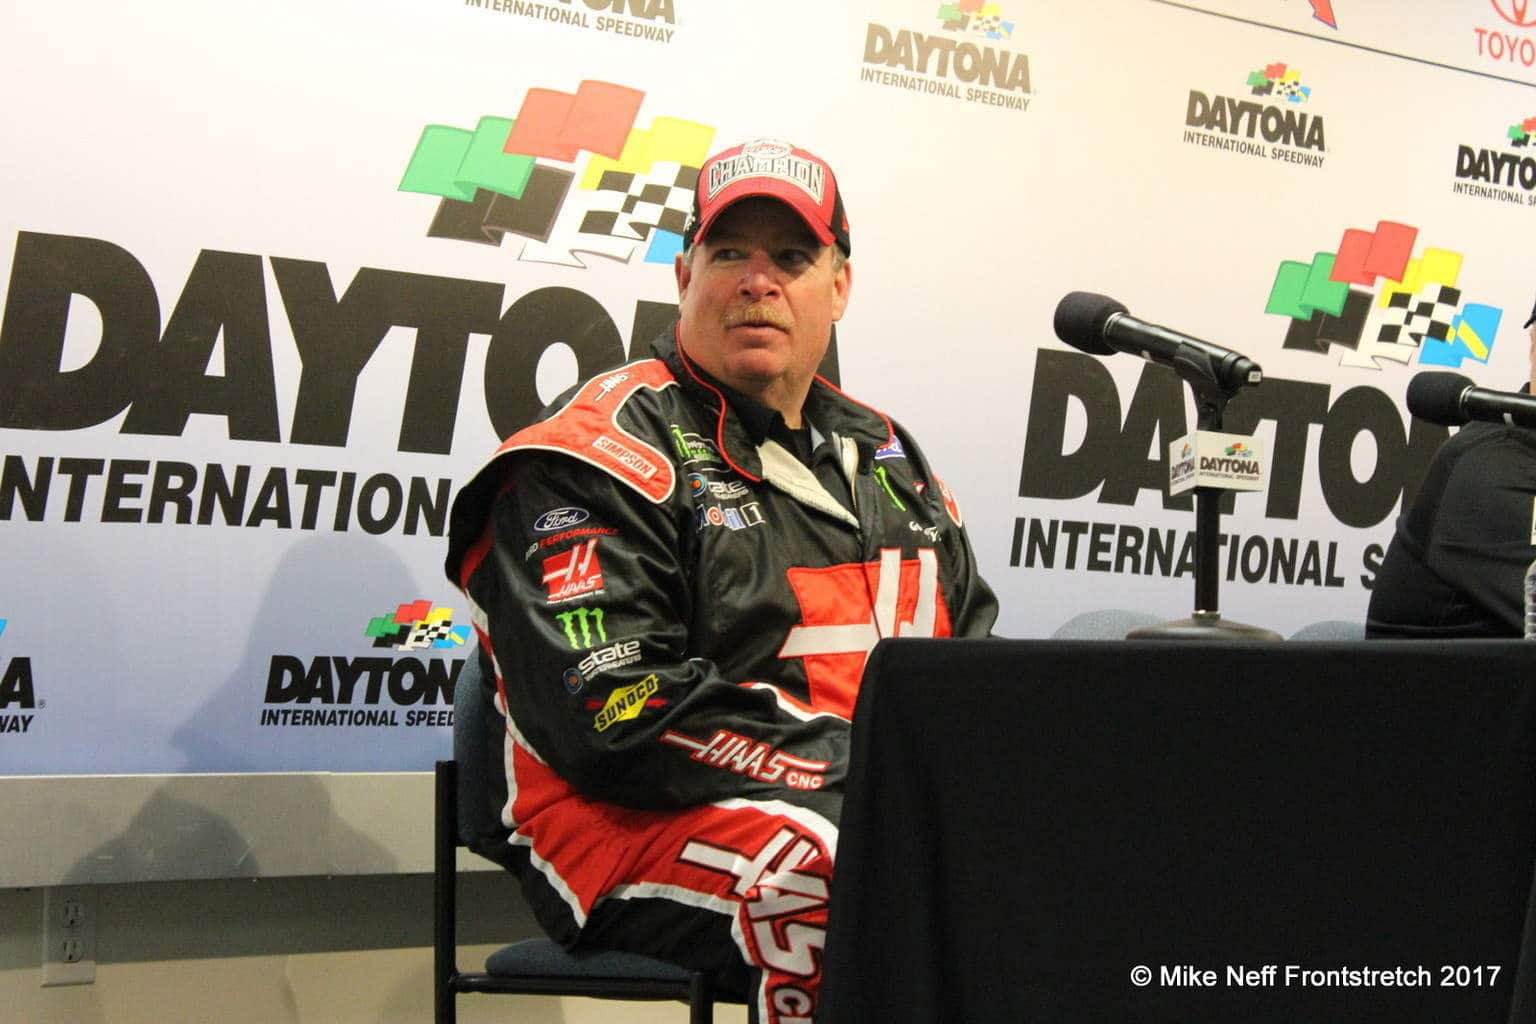 Tony Gibson Daytona Post Race Cup 2017 Mike Neff